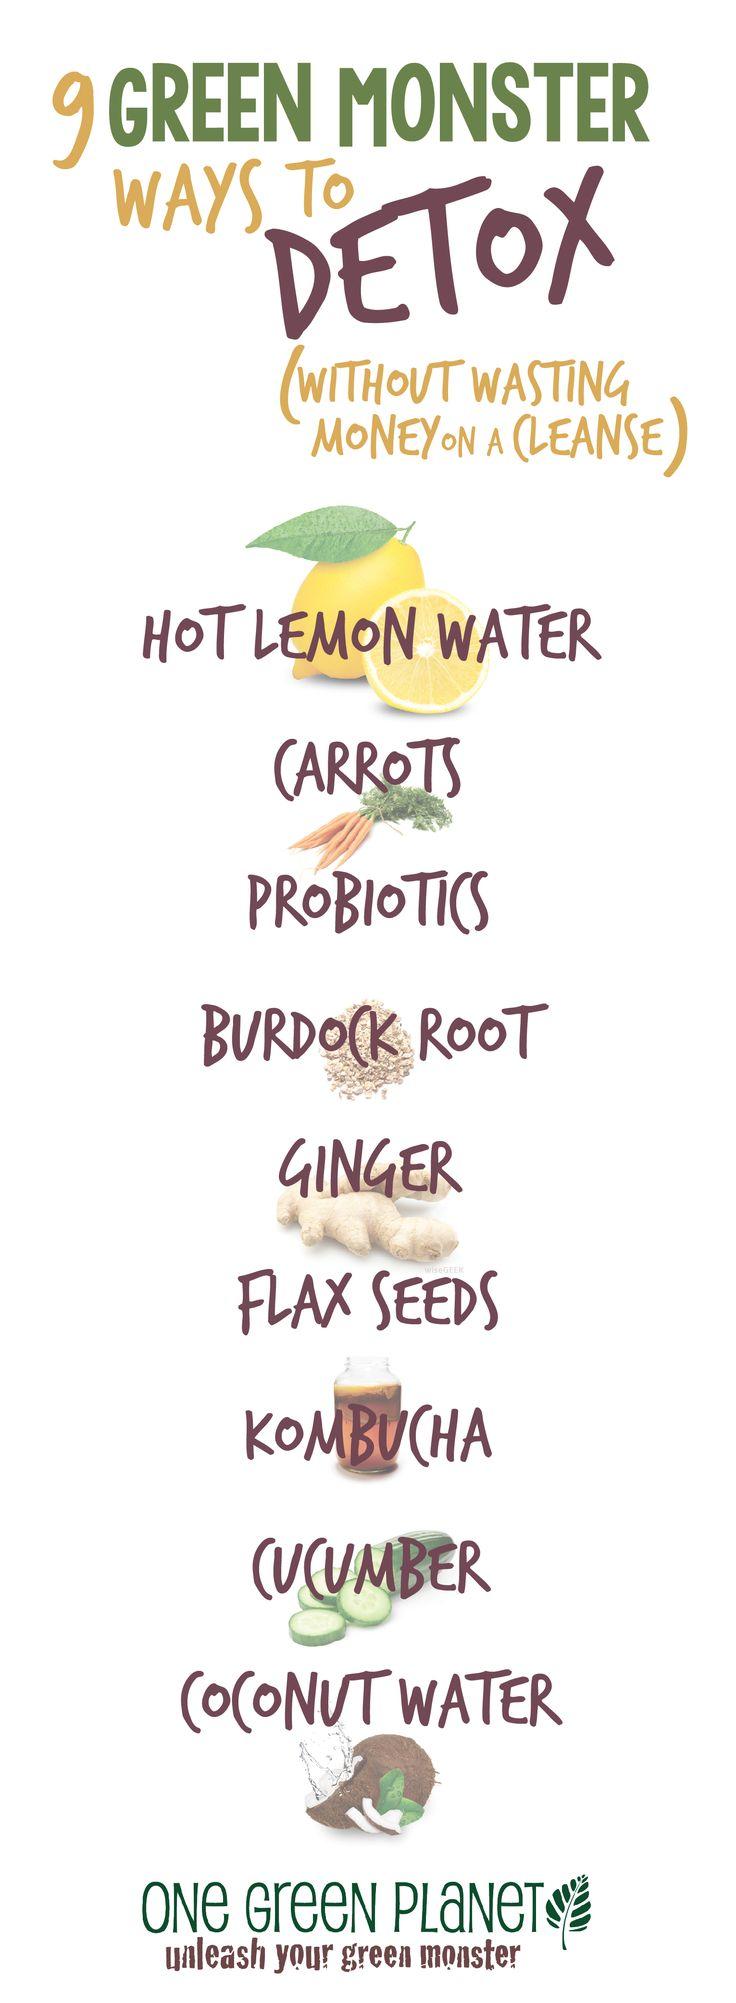 Natural plant based diet: detox naturally